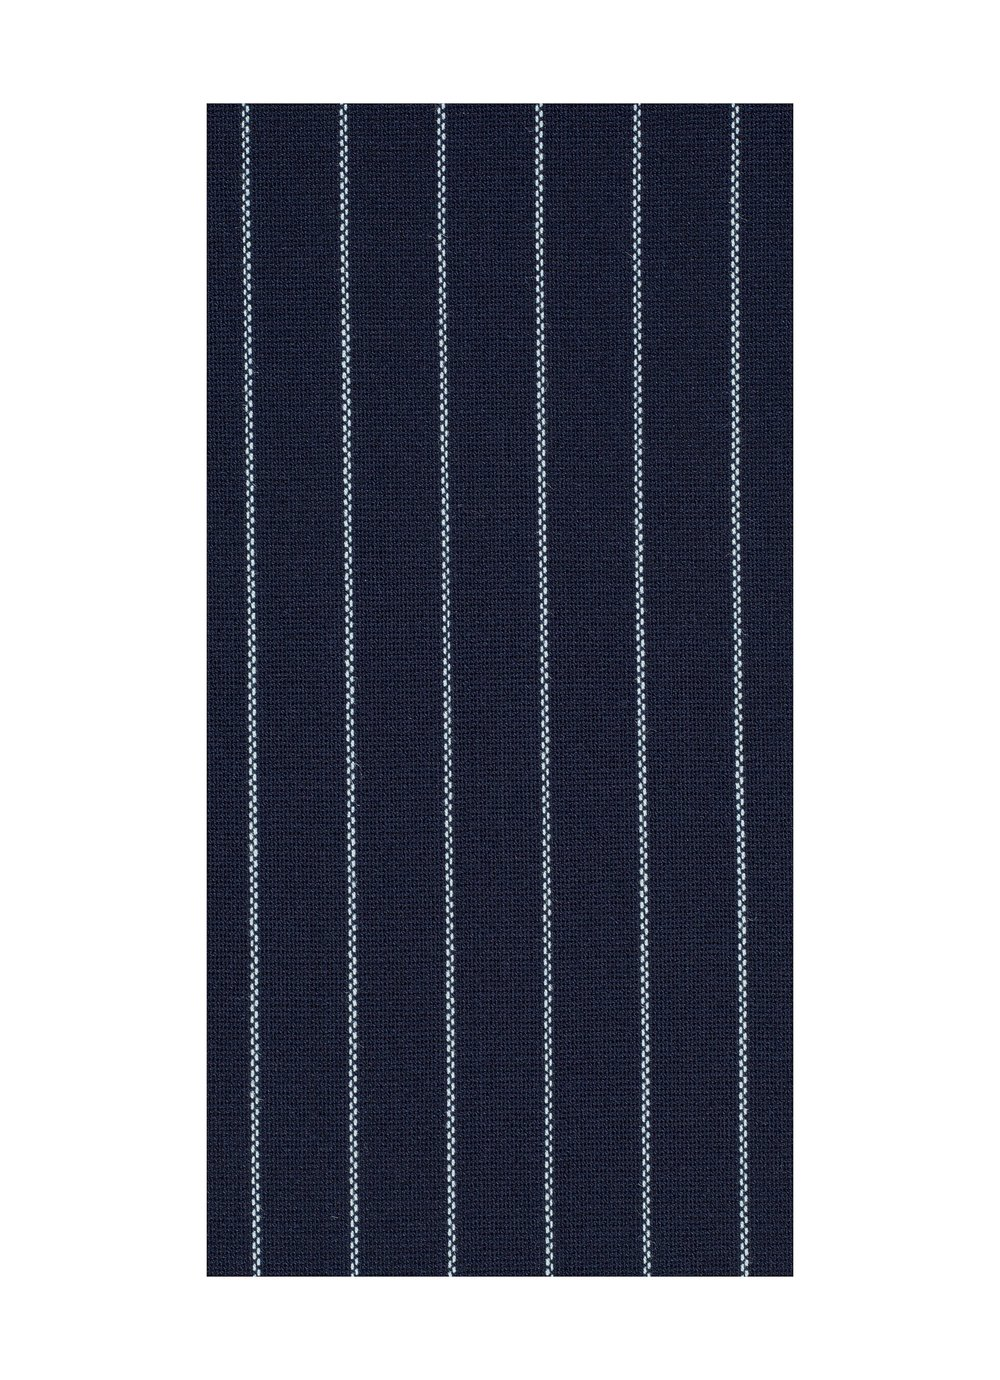 Suits_Blue_Stripe_Havana_P5112_Suitsupply_Online_Store_2.jpg